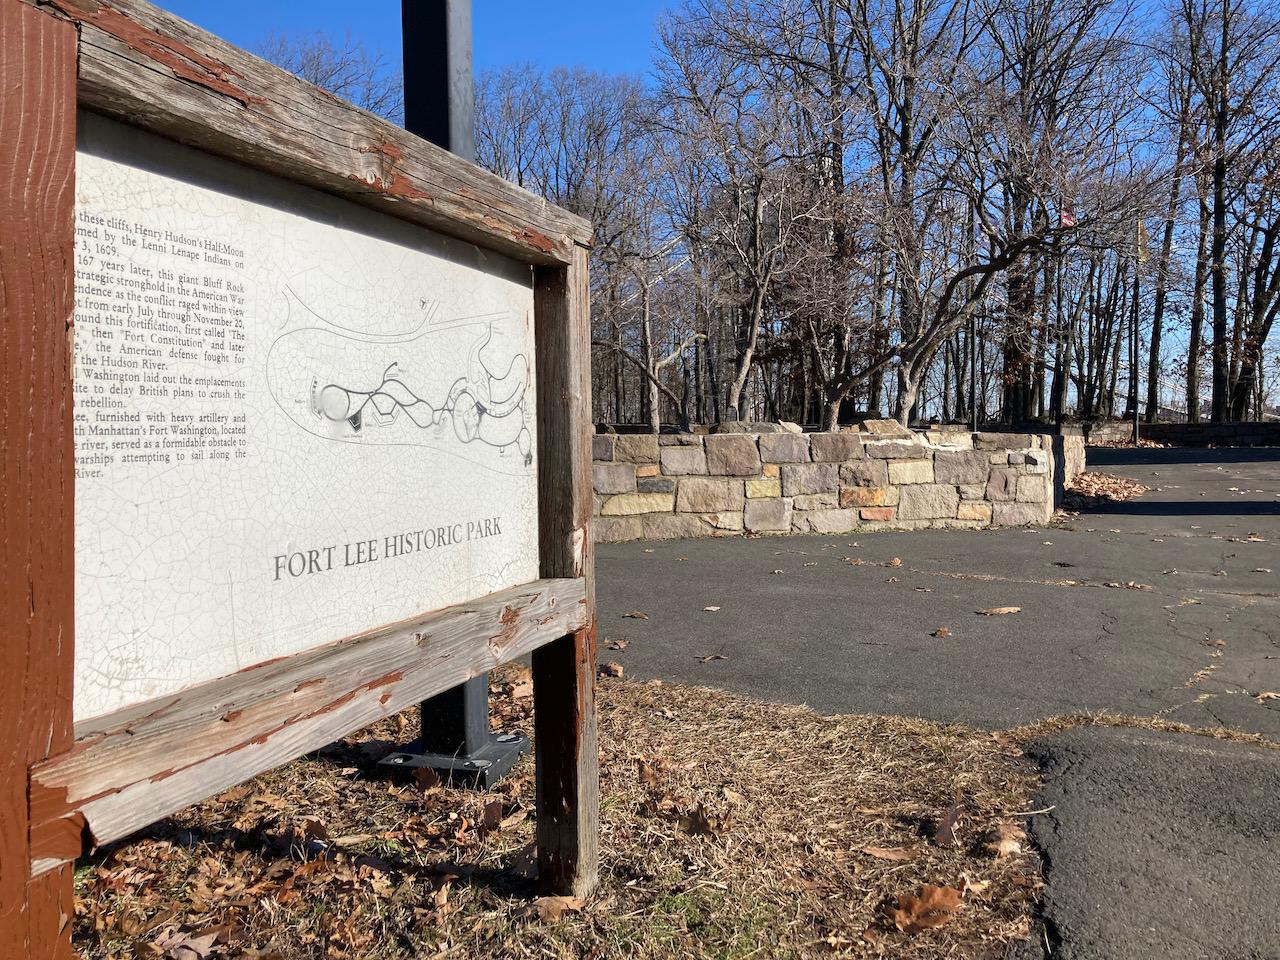 Entrance sign to Fort Lee Historic Park.